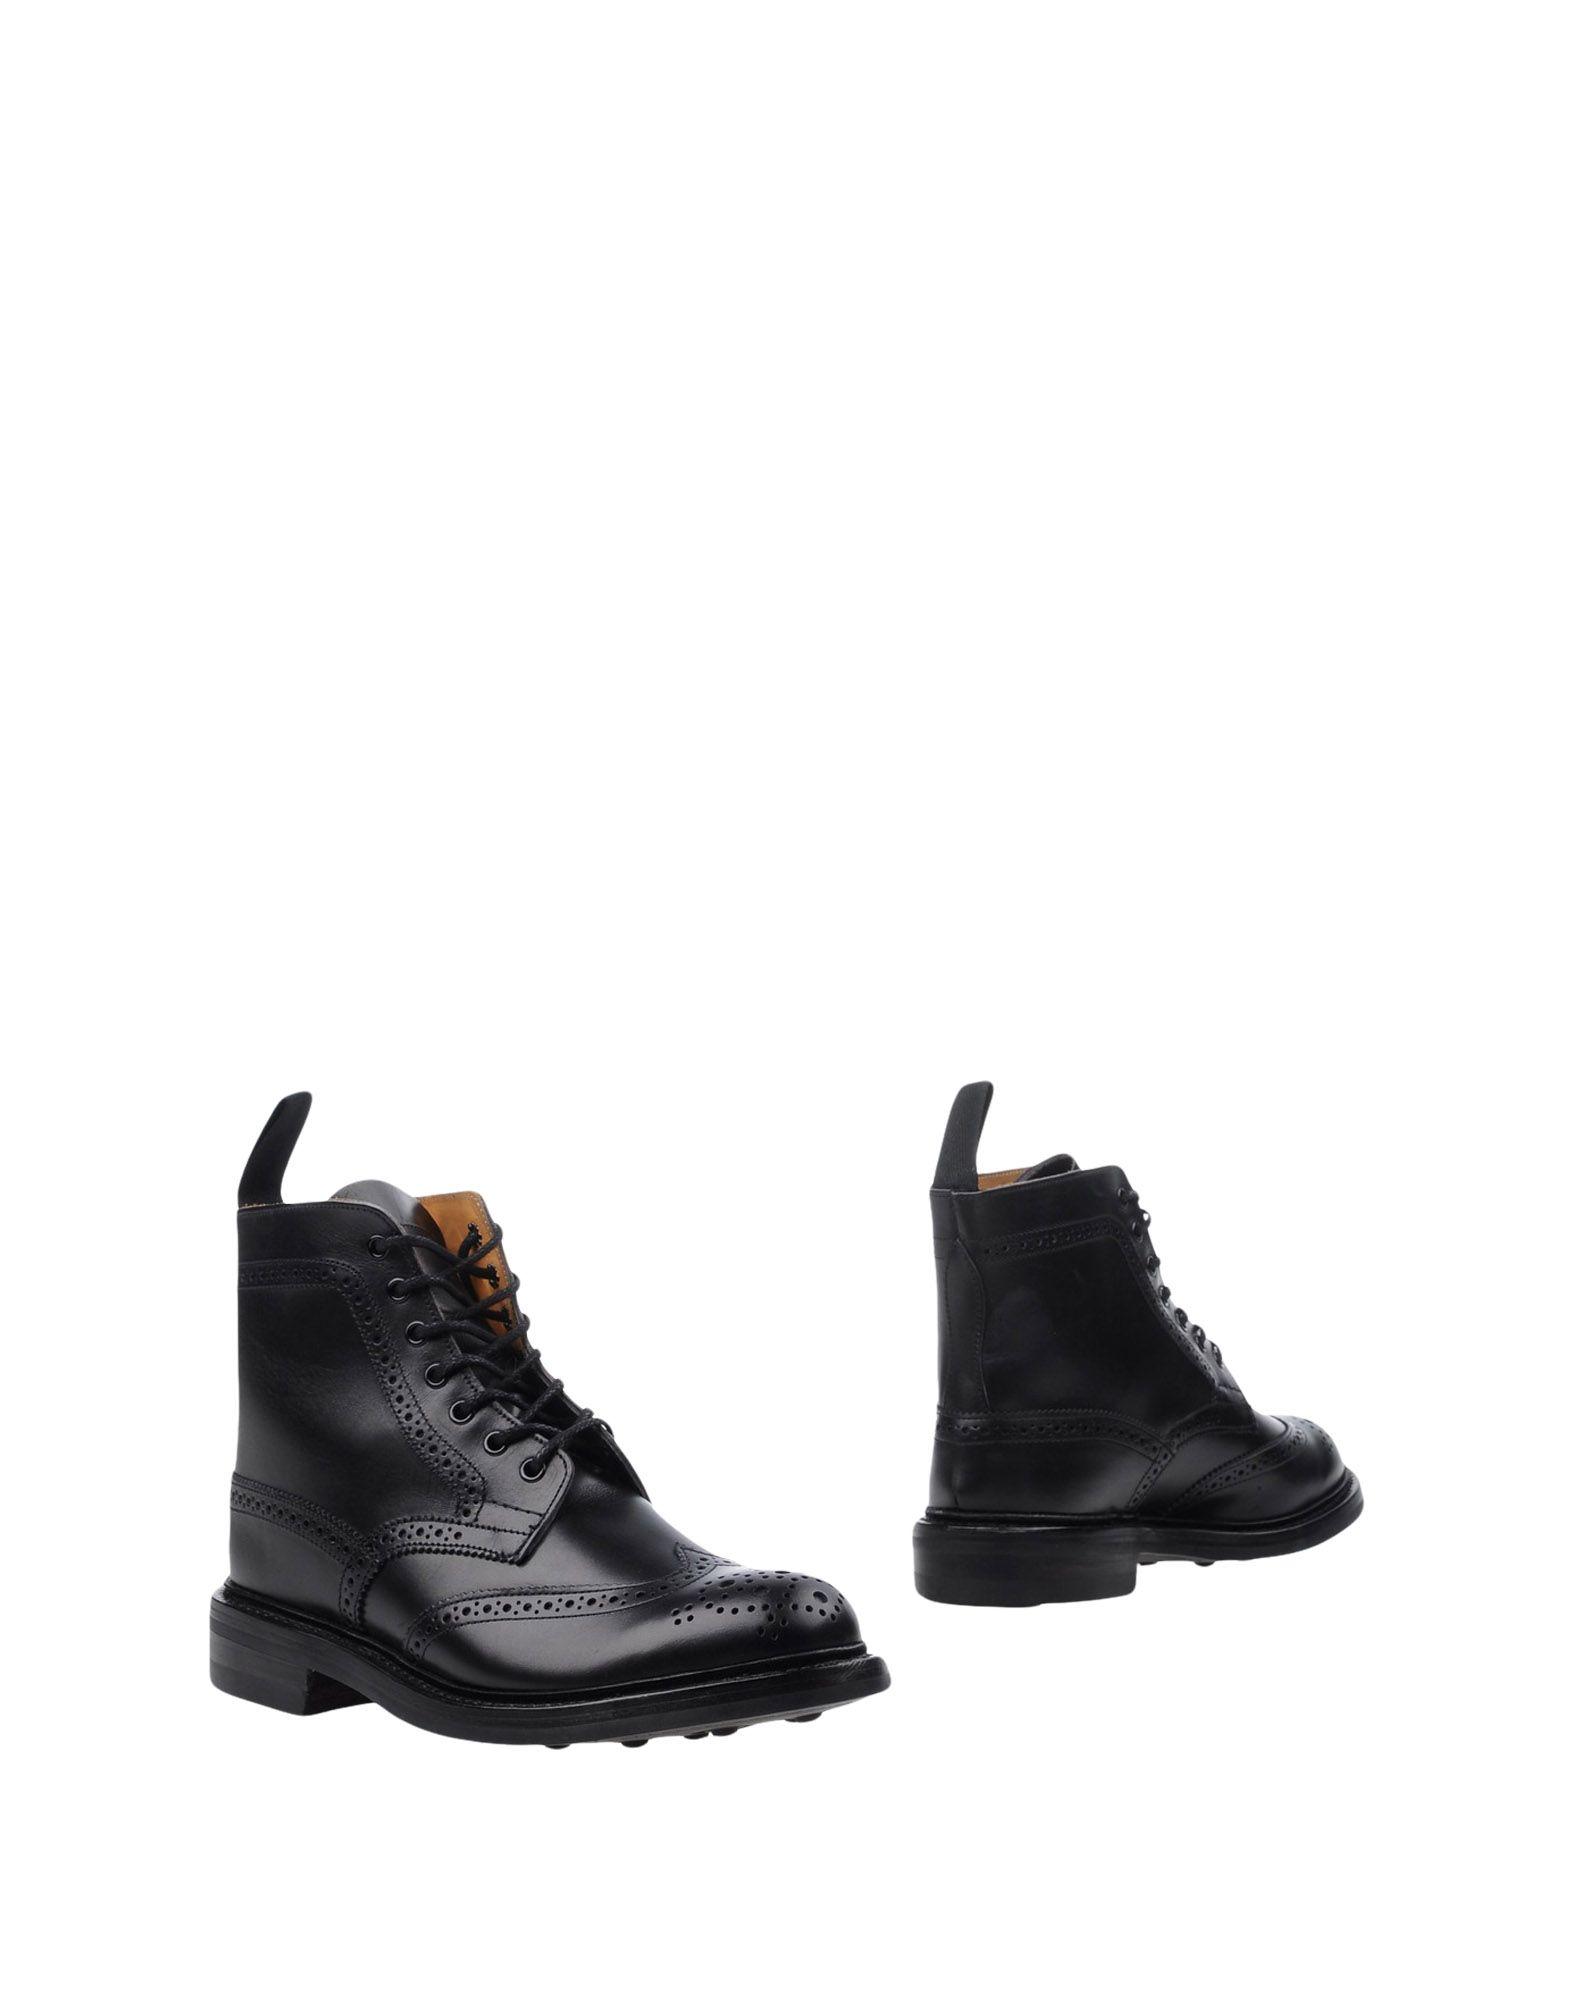 Rabatt Schuhe Tricker's Stiefelette Damen  11361521MG